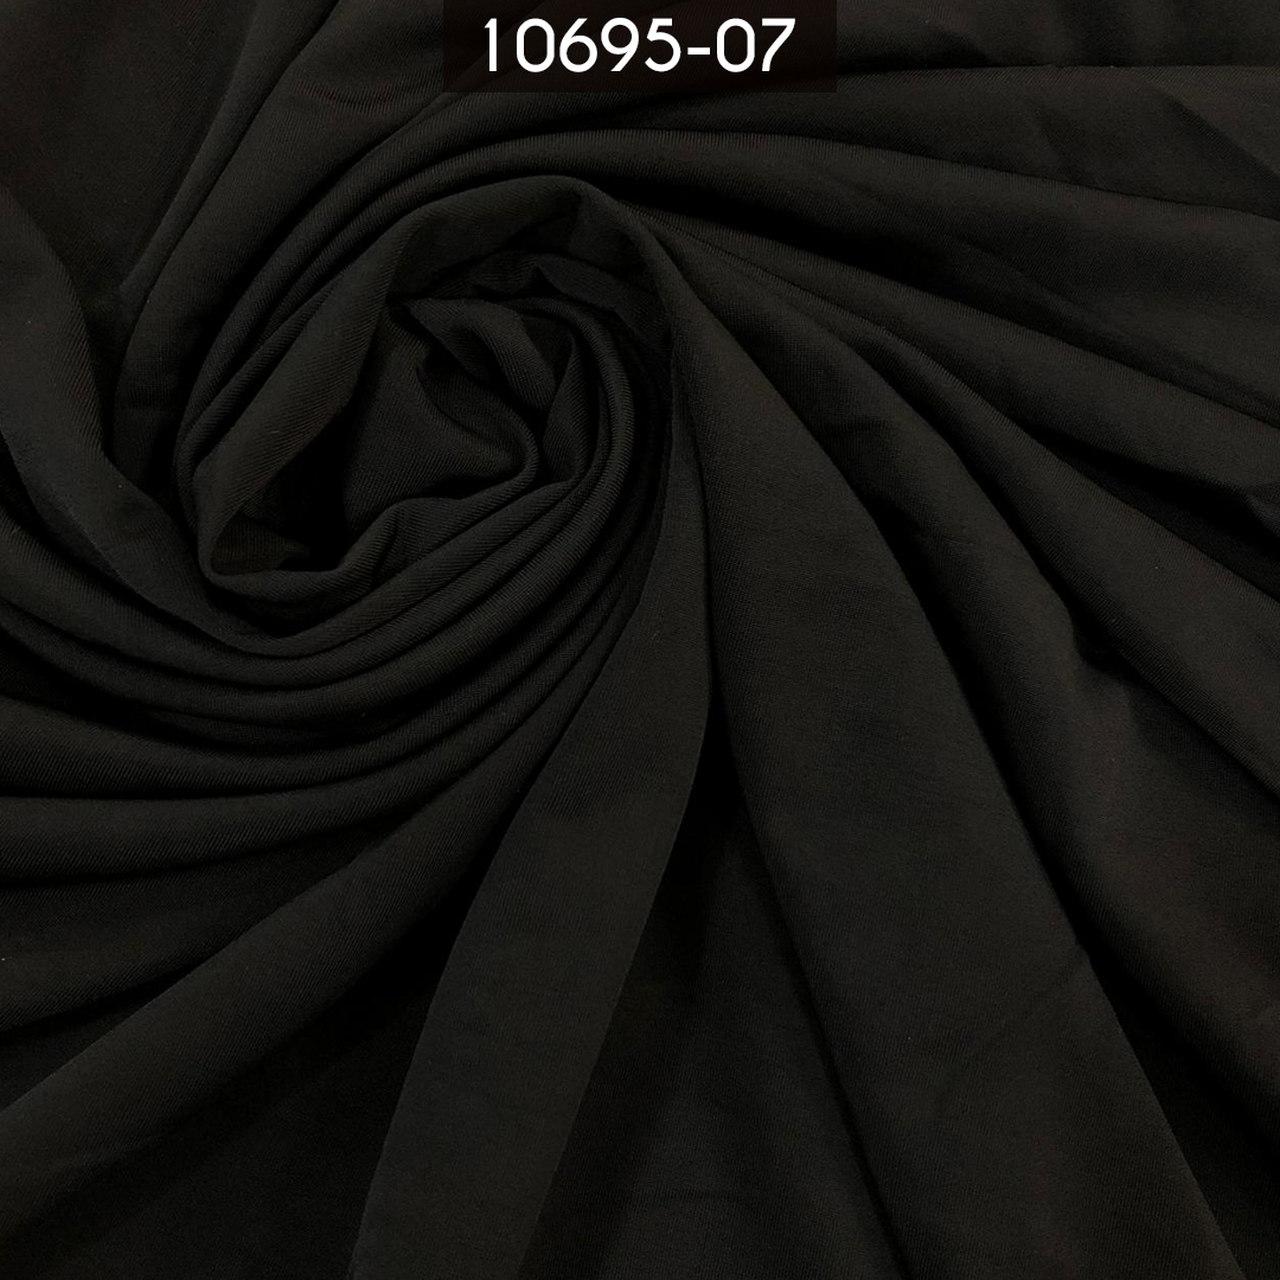 Tecido Malha Liga Light 10695 96%Poliéster 4%Elastano Preto